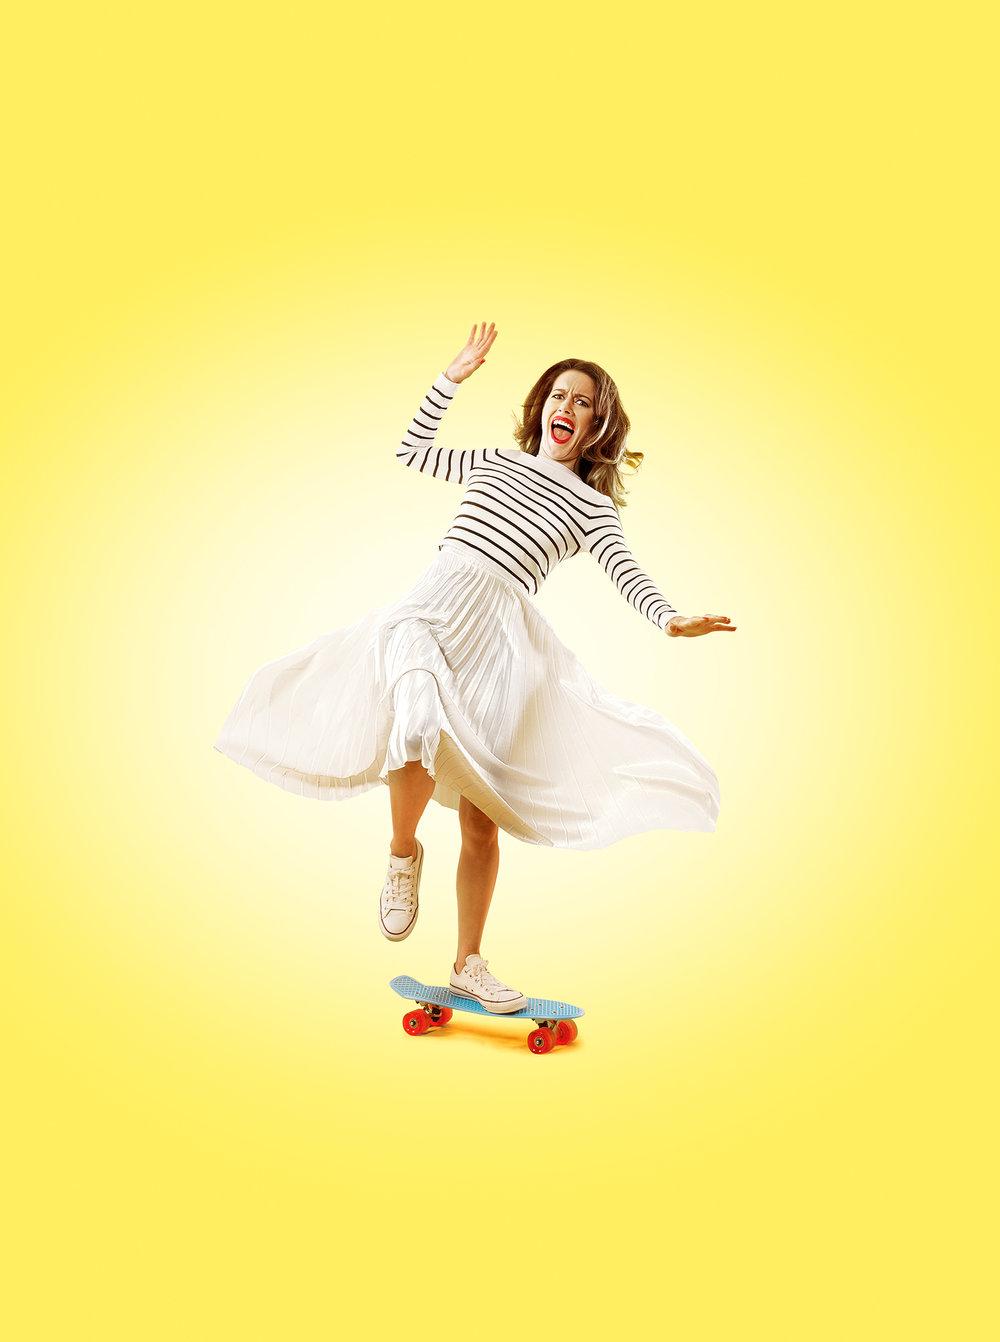 Eflow-Skateboard.jpg